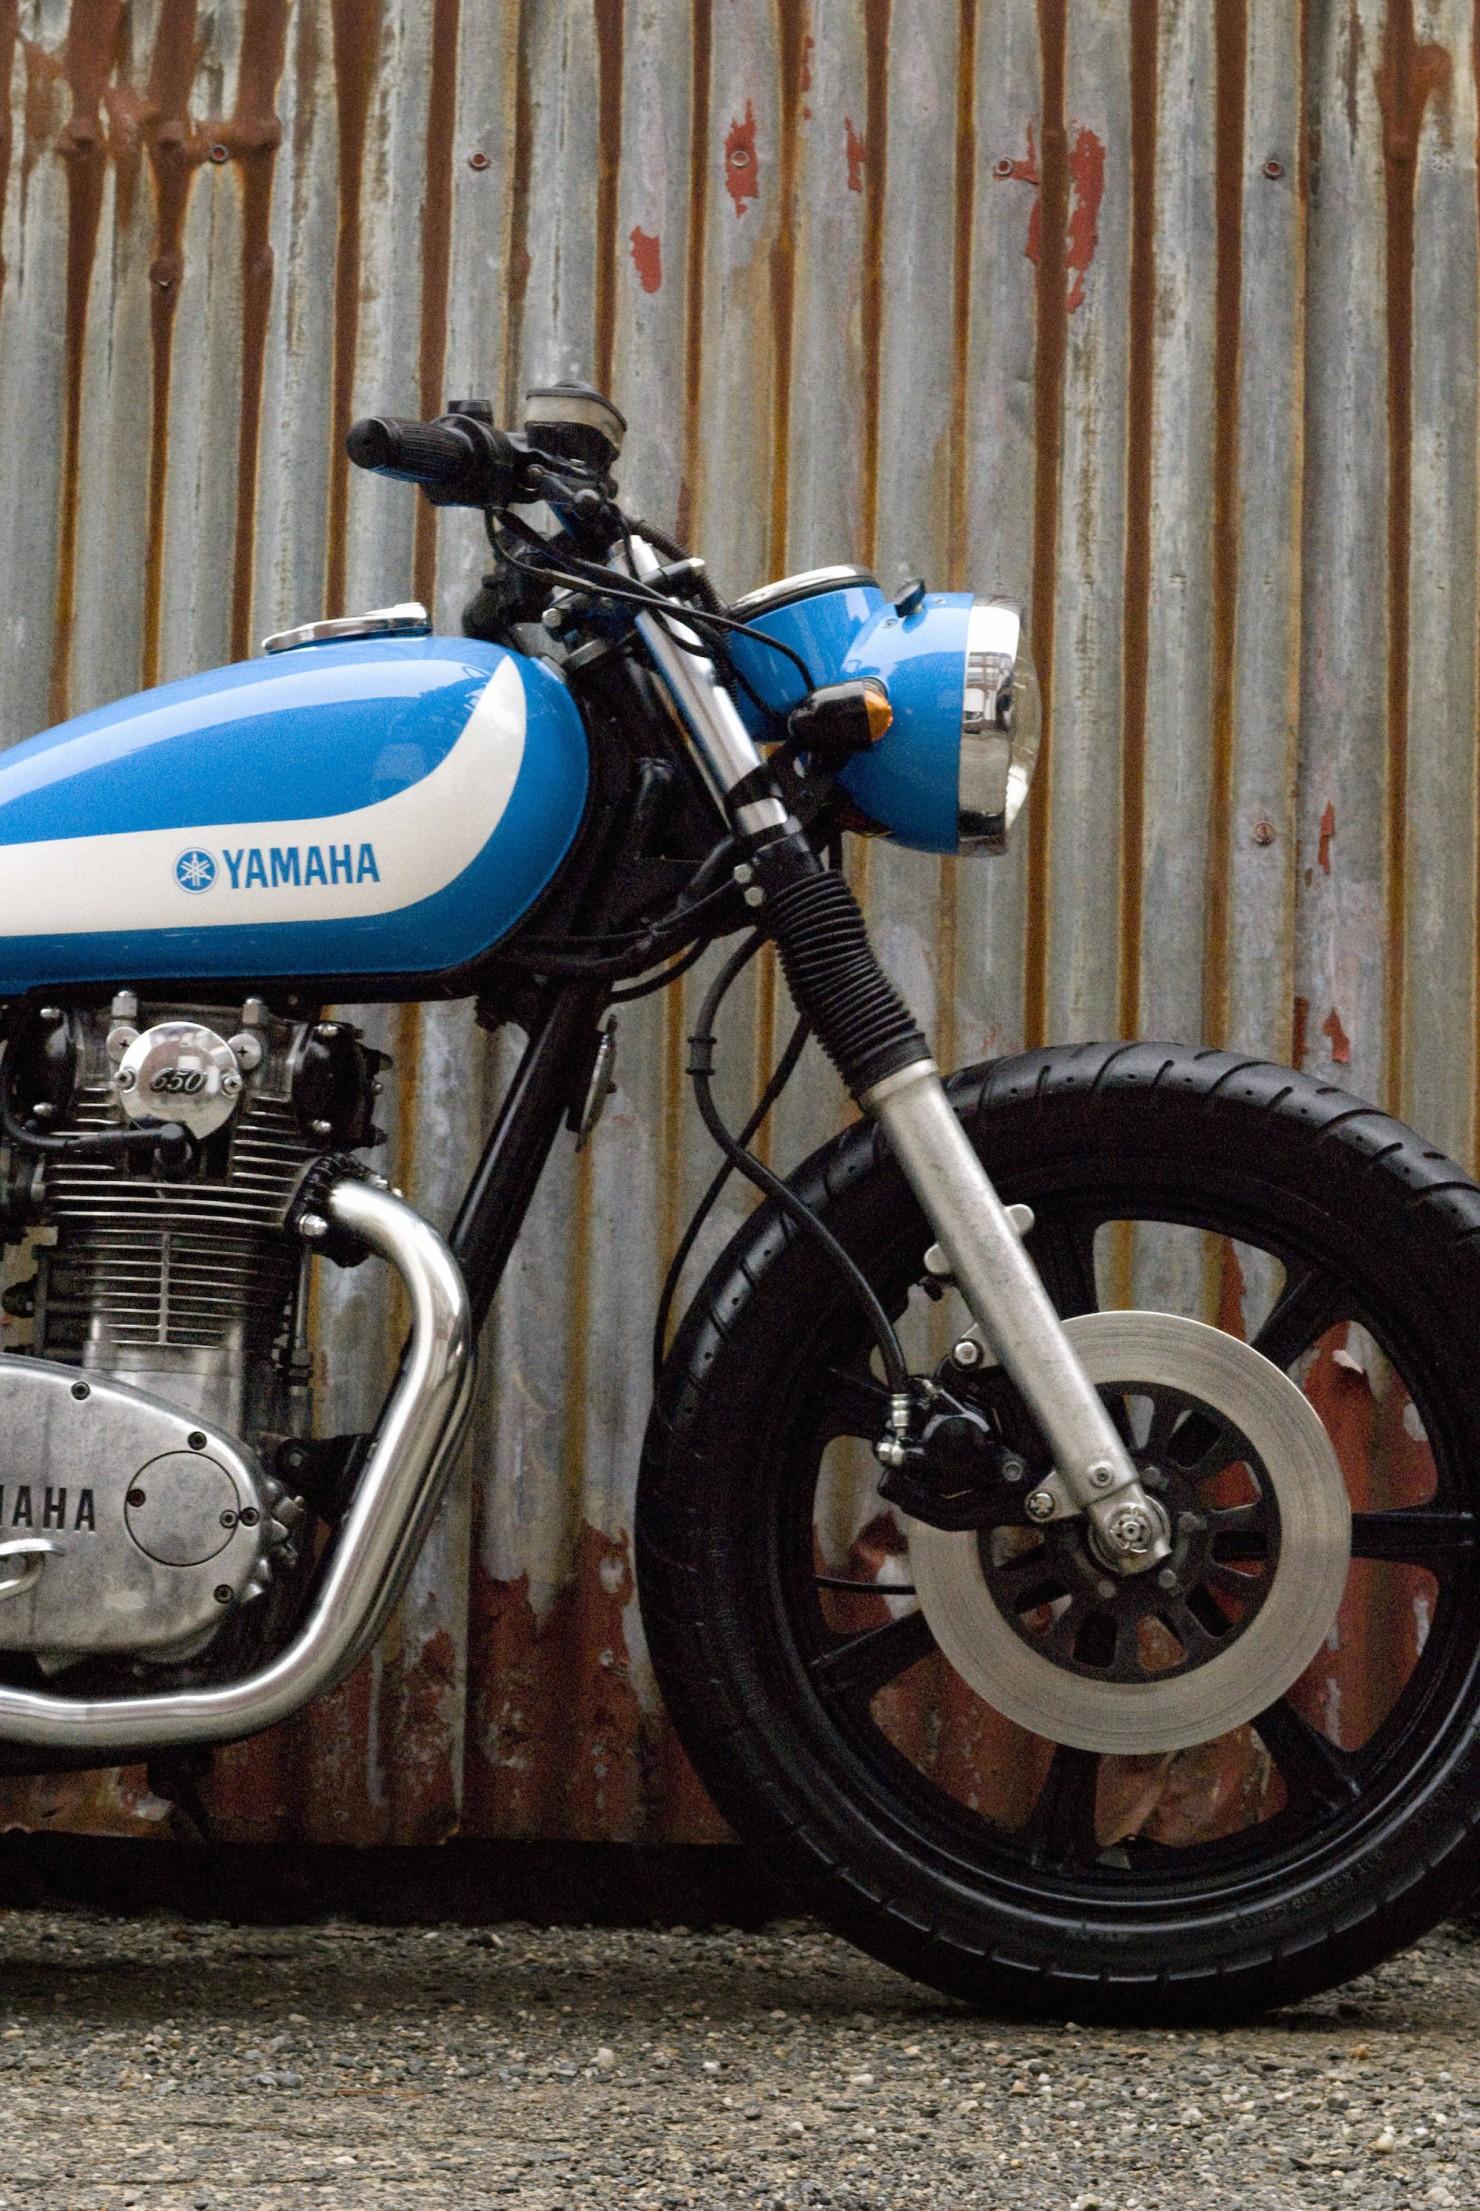 Yamaha XS650 by vintagesteele_10